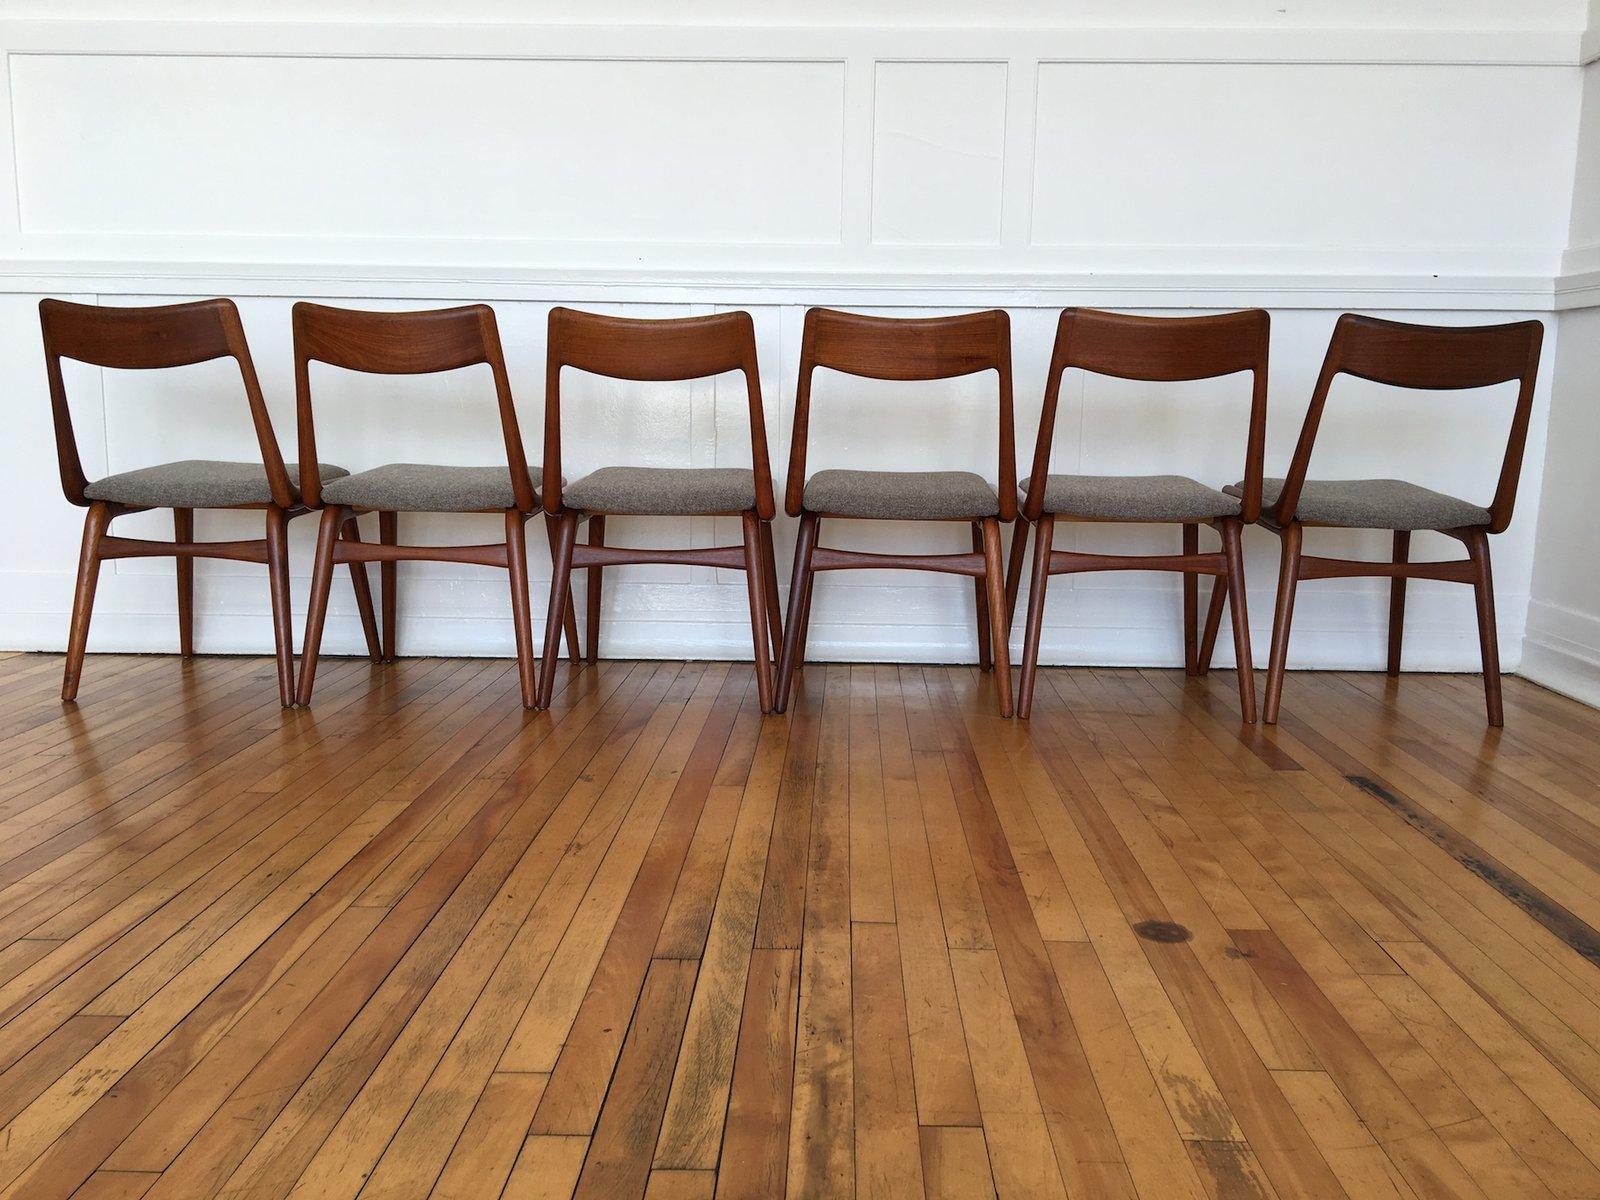 Vintage Danish Teak Boomerang Dining Chairs by Erik Christensen